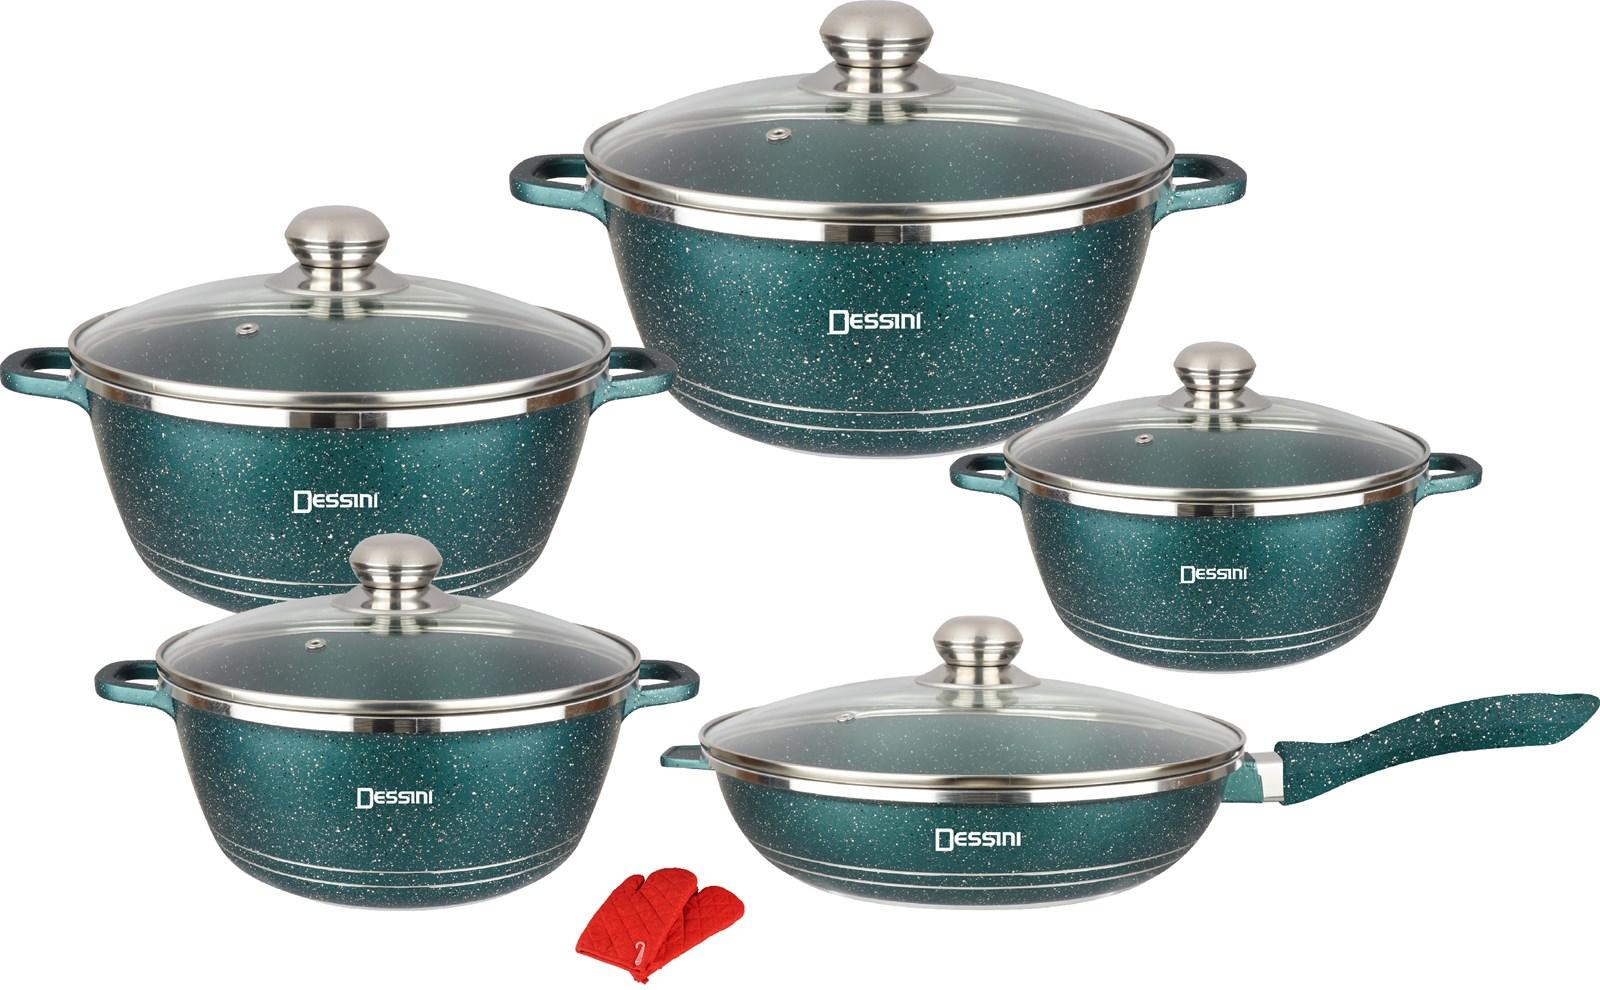 Dessini brand 12pcs cookware set granite coatin pan set nonstick pots sets